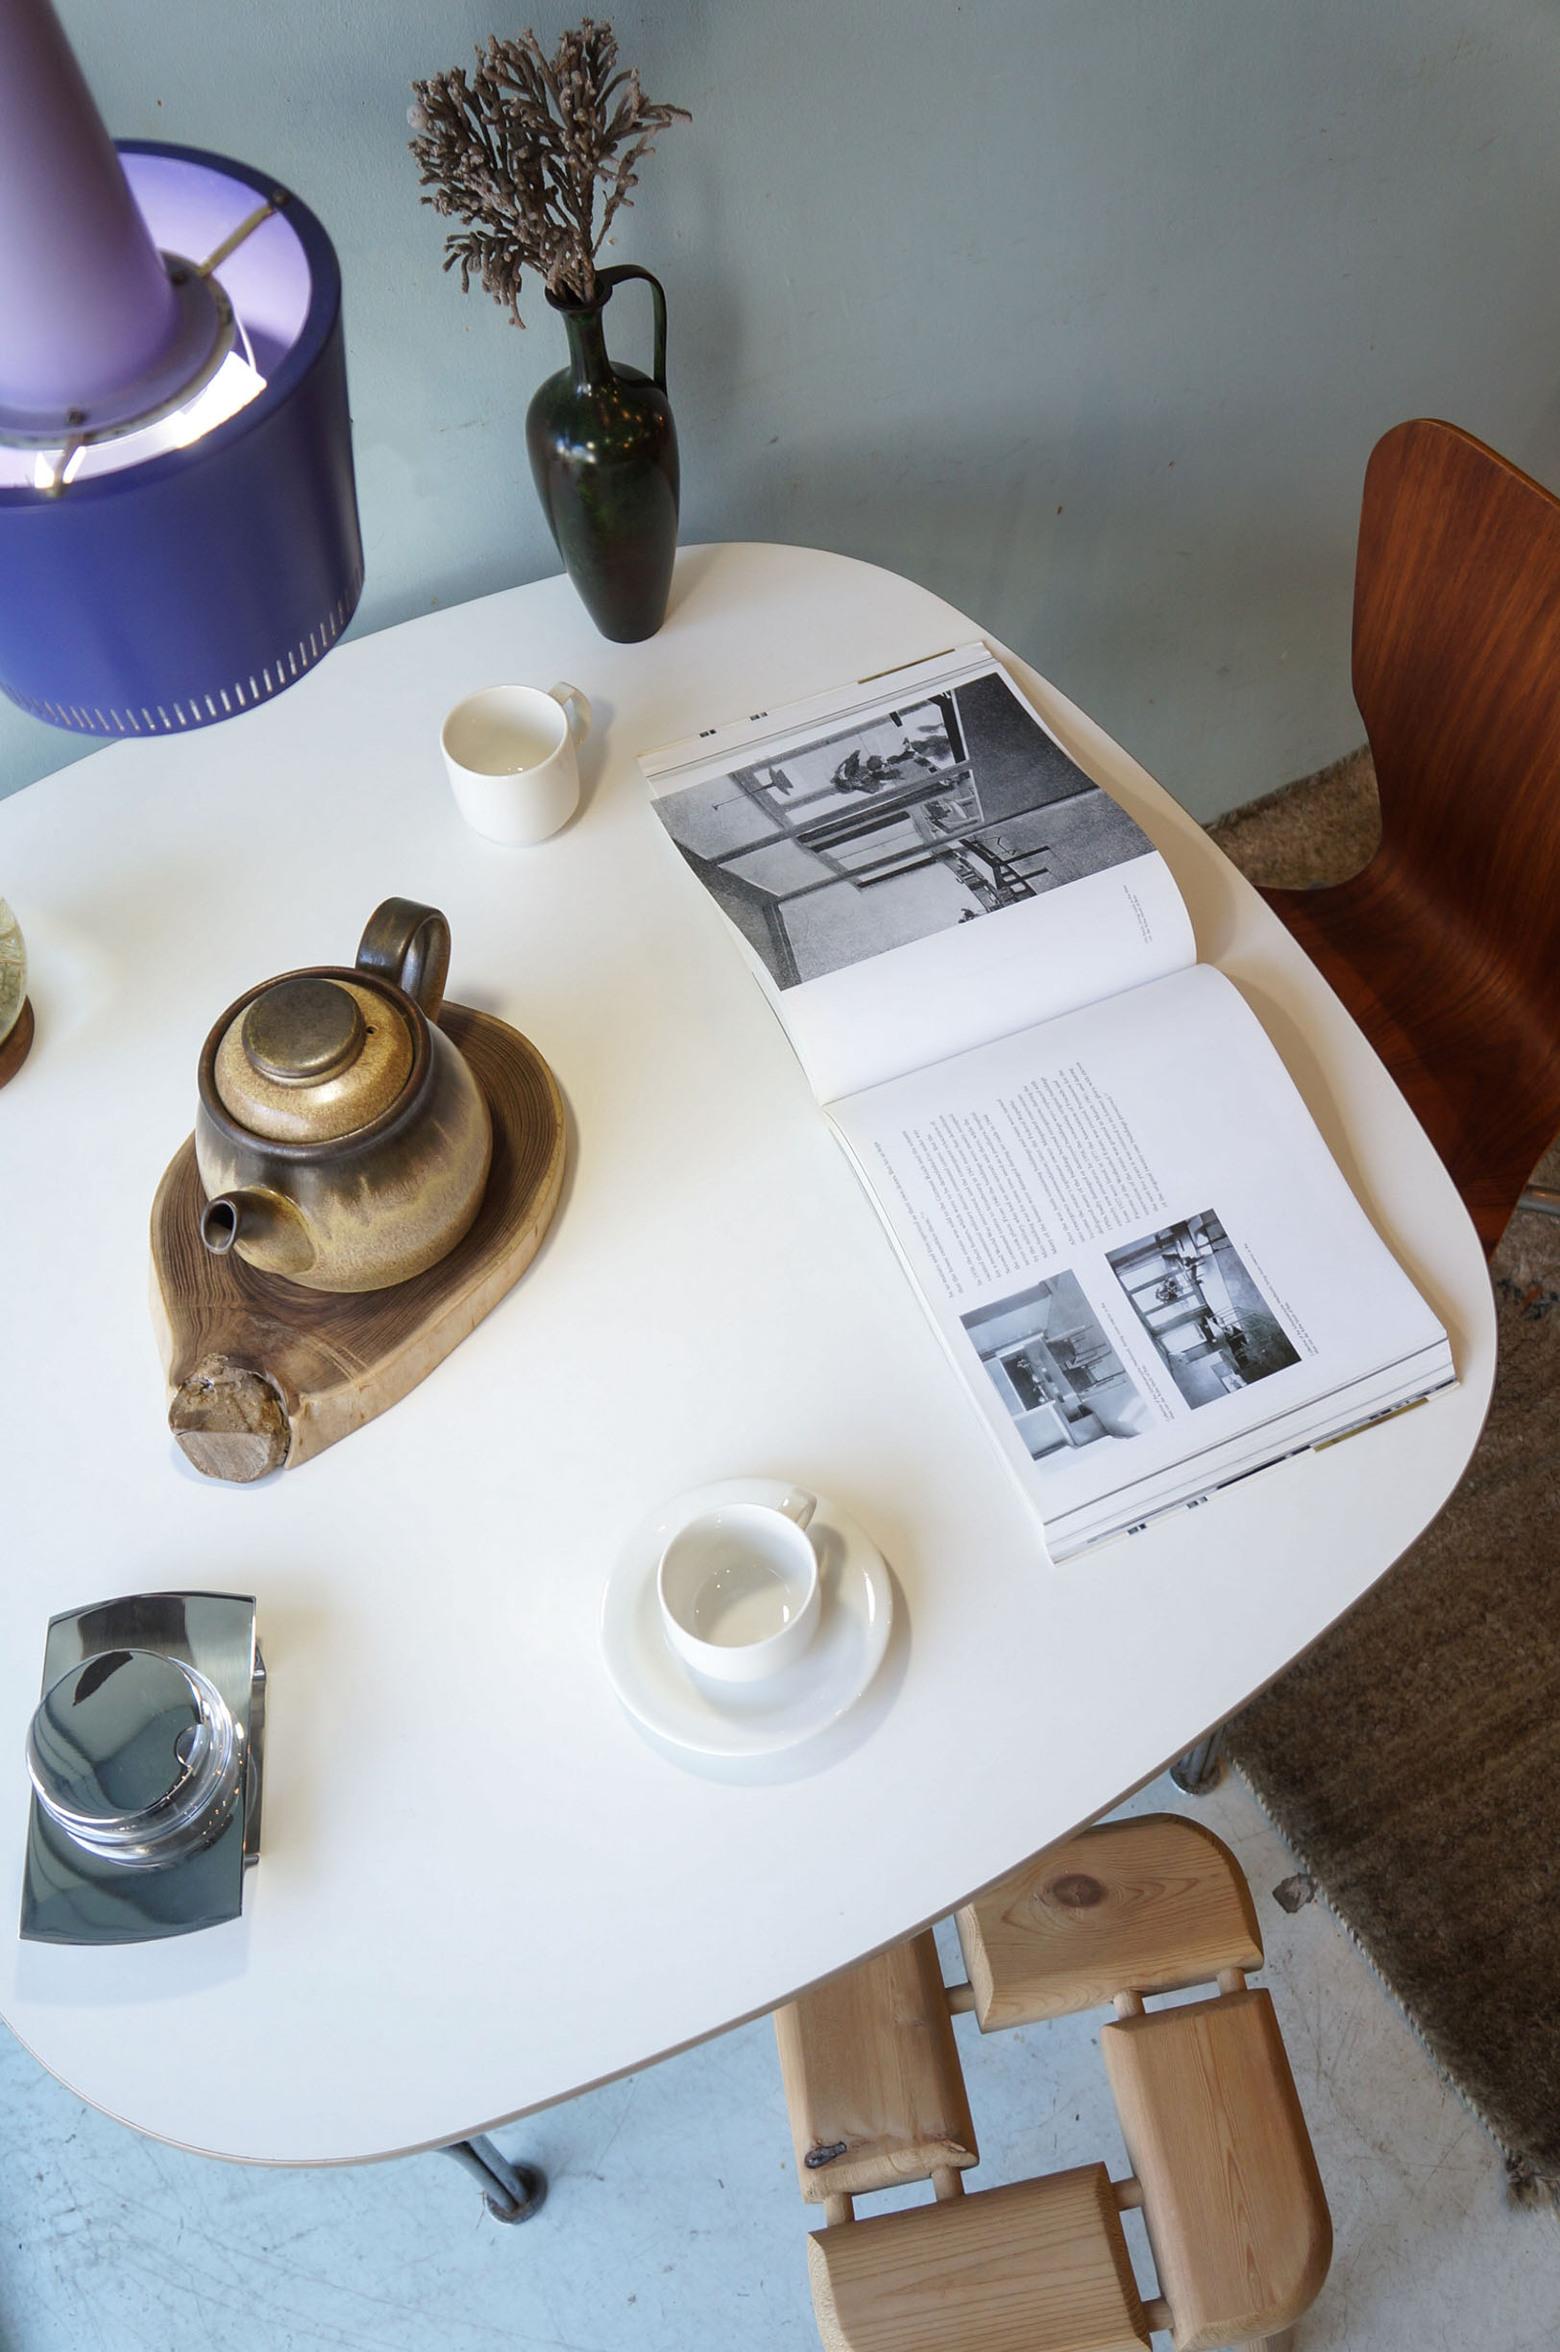 Fritz Hansen Dining Table by Piet Hein 1970's/フリッツハンセン スーパー円テーブル Bテーブル ピート・ハイン 北欧ヴィンテージ 4